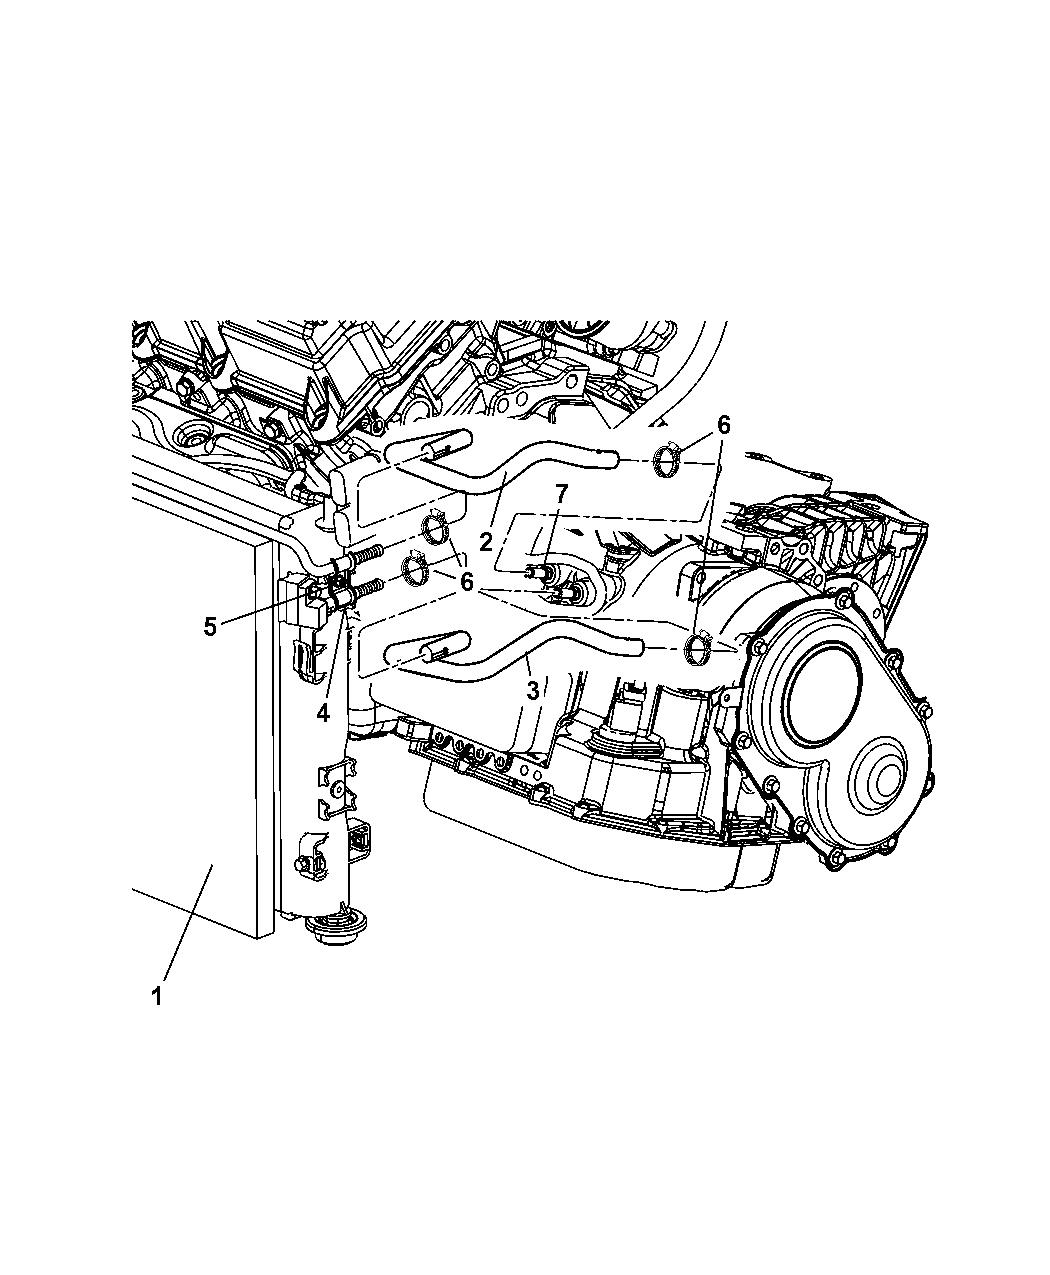 2006 Dodge Stratu 2 7 Engine Diagram - Cars Wiring Diagram